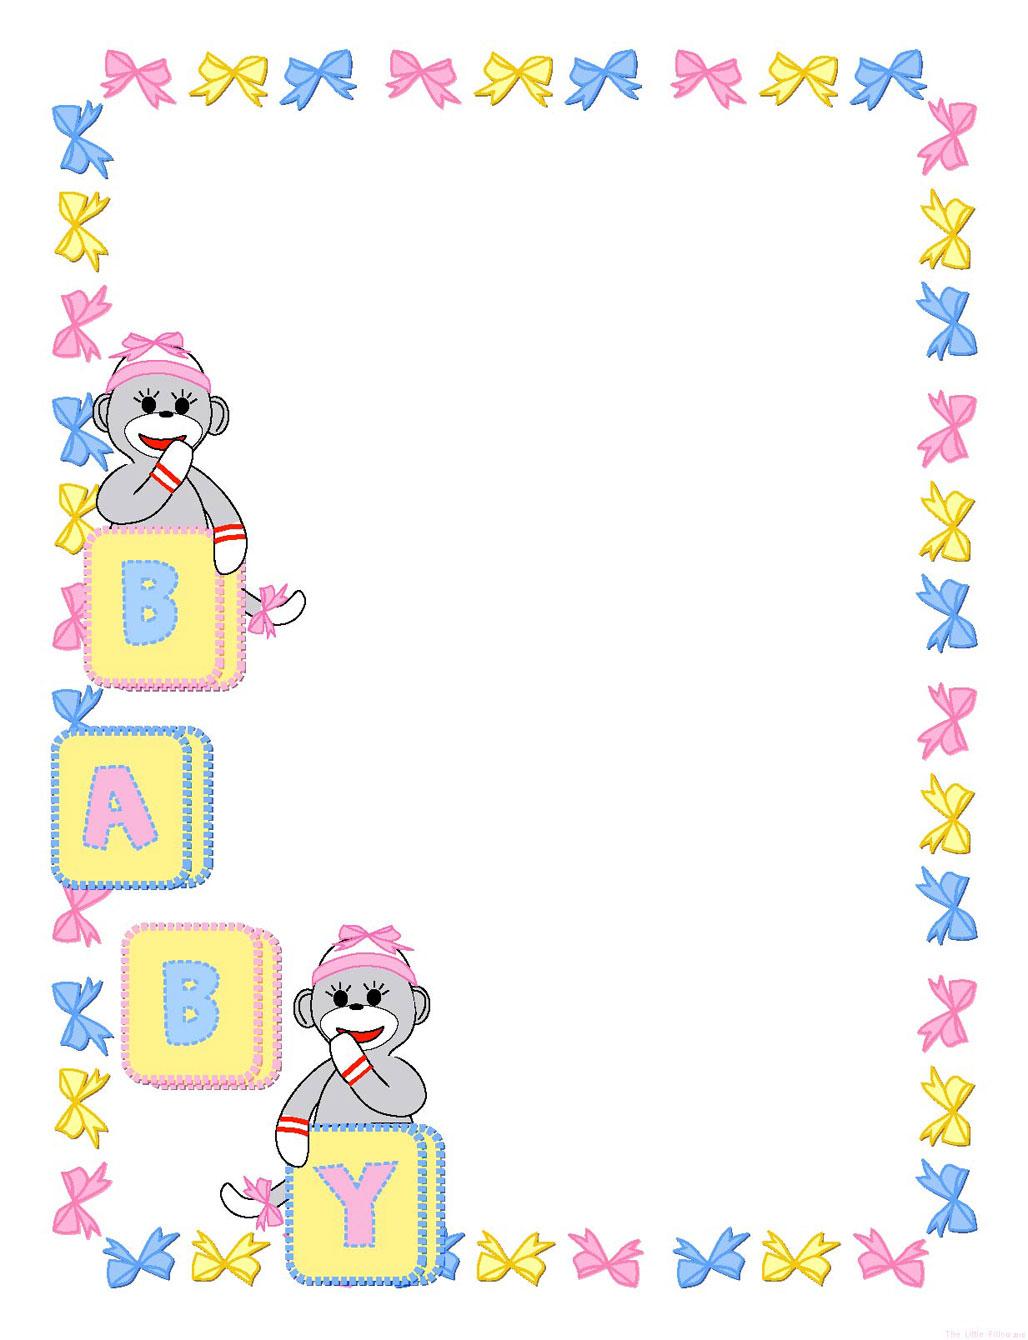 Free Printable, Digital, Scrapbook Template Pages, New Born, Baby - Free Printable Baby Scrapbook Pages